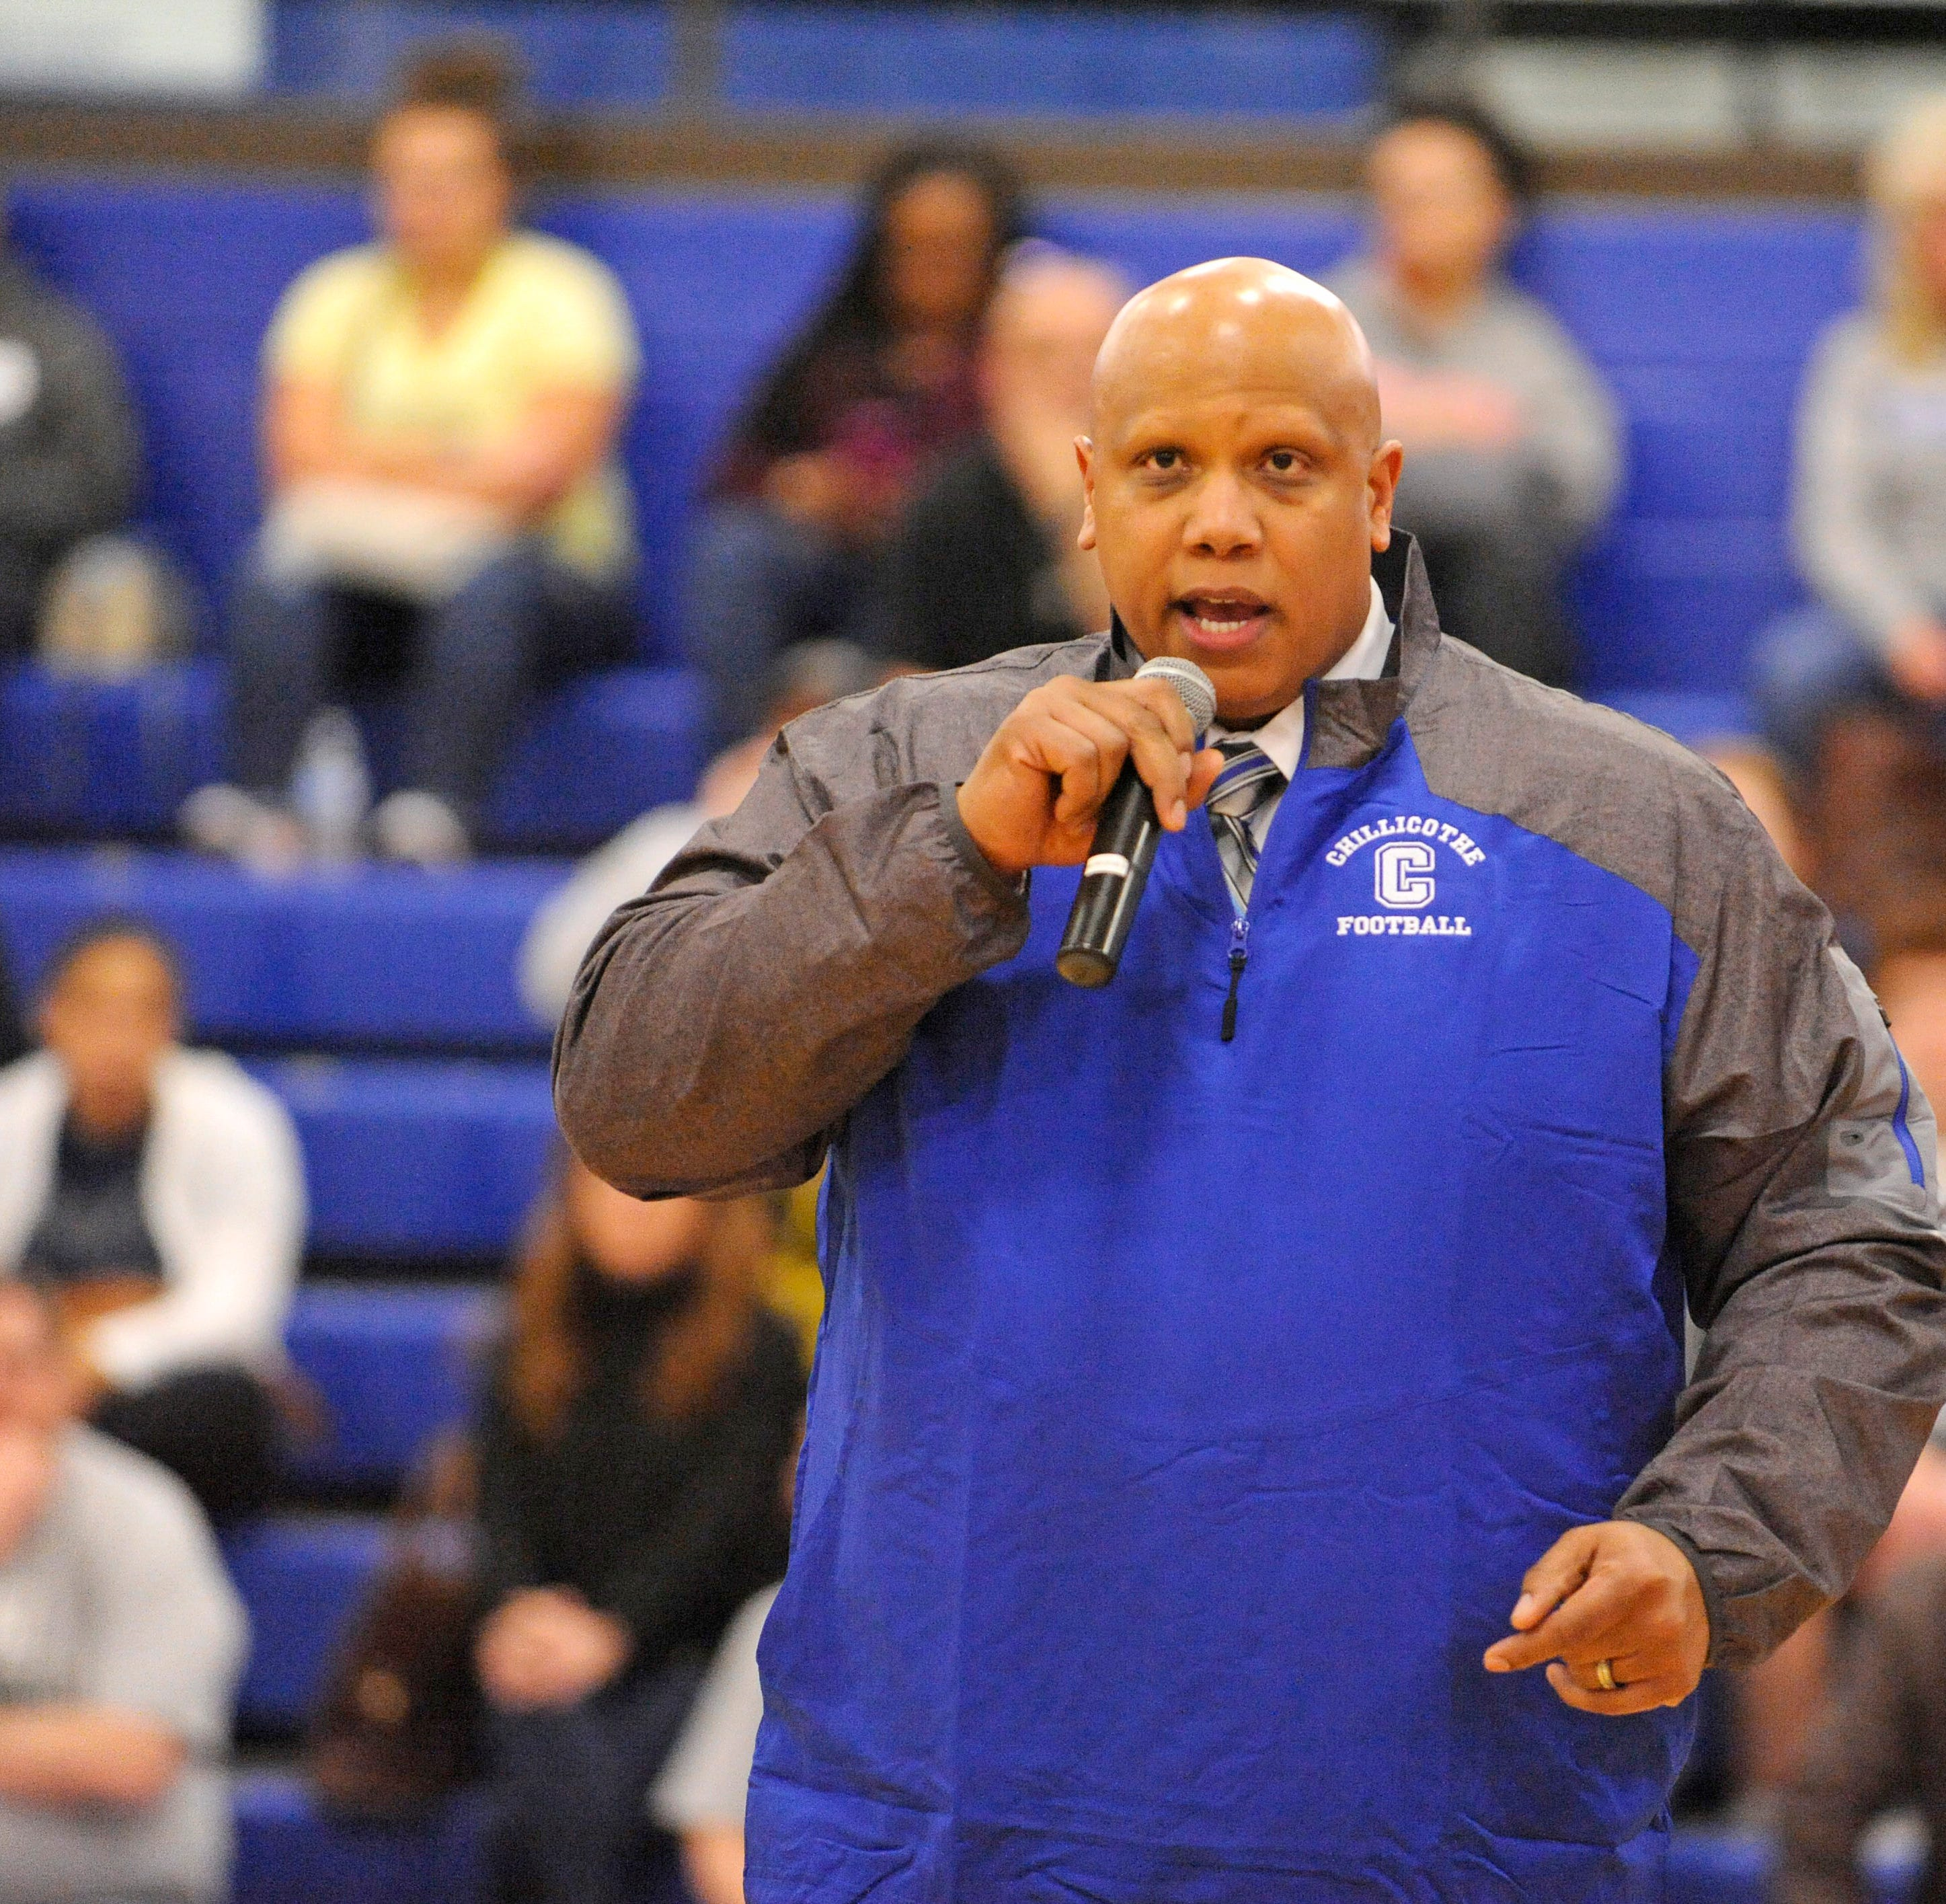 Chillicothe High School names Doug Pryor as new head football coach